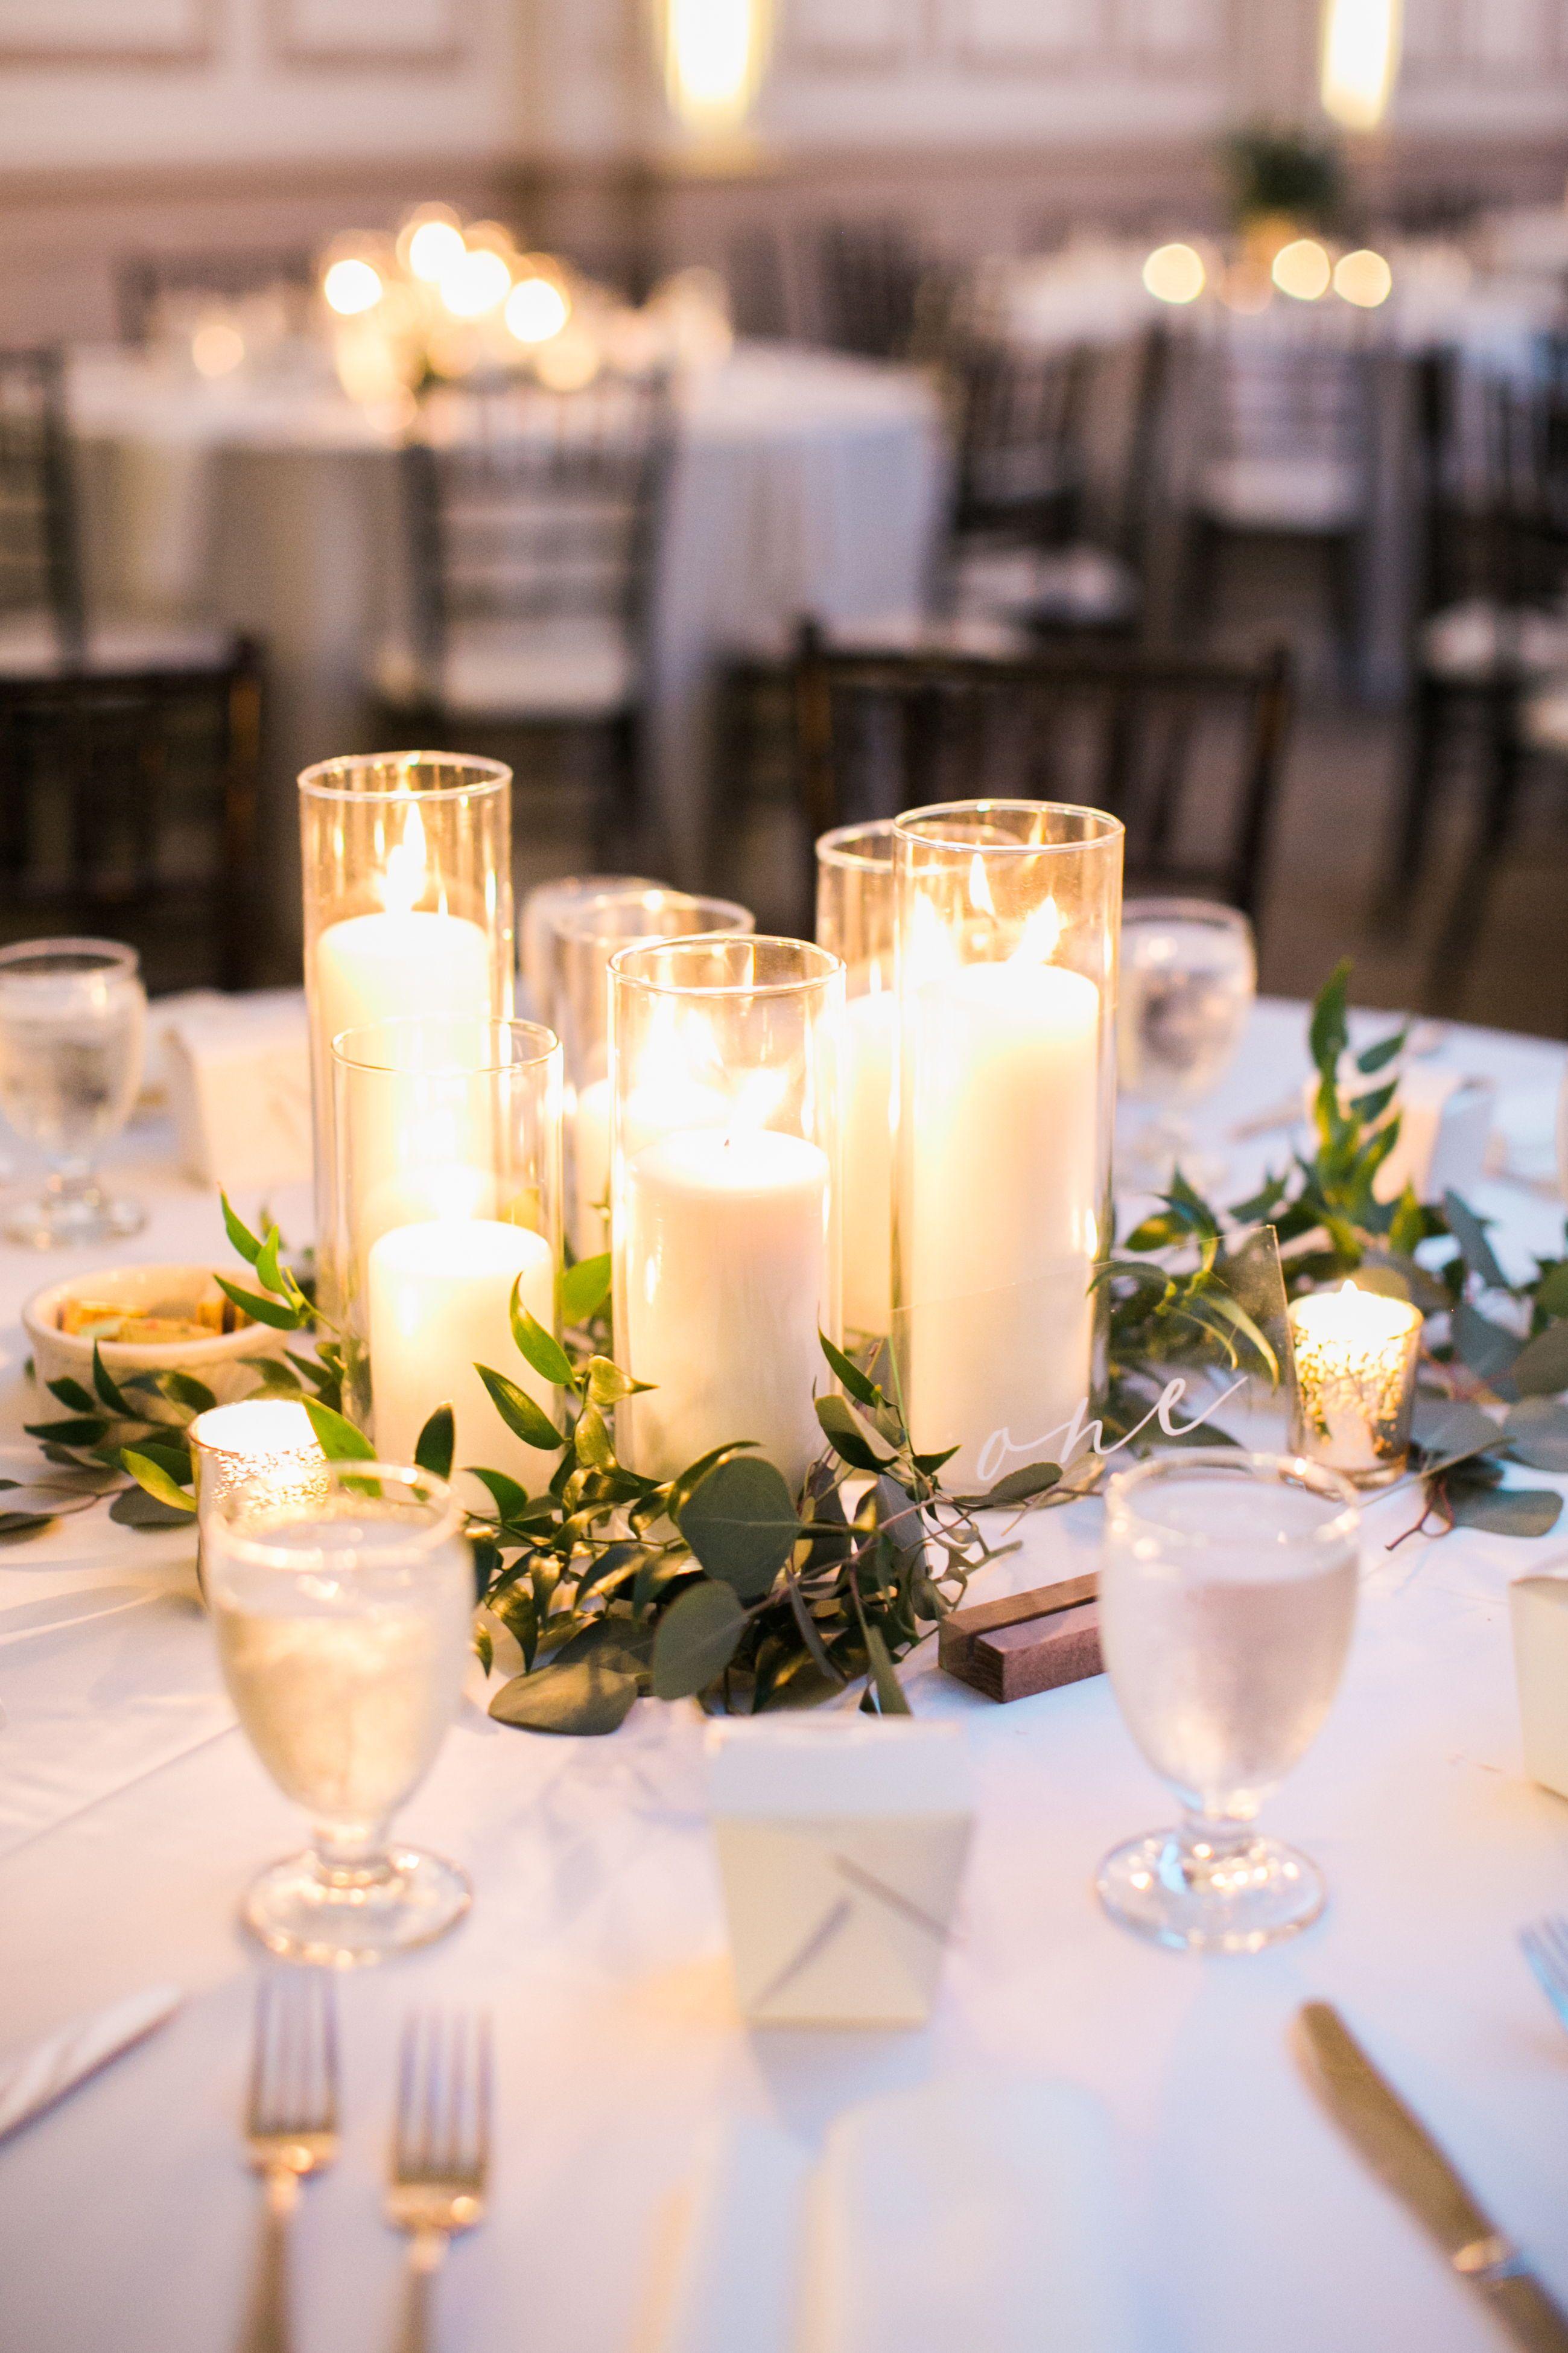 Jade Violet Wedding Floral Wedding Candles Table Cheap Wedding Table Centerpieces Wedding Table Centerpieces